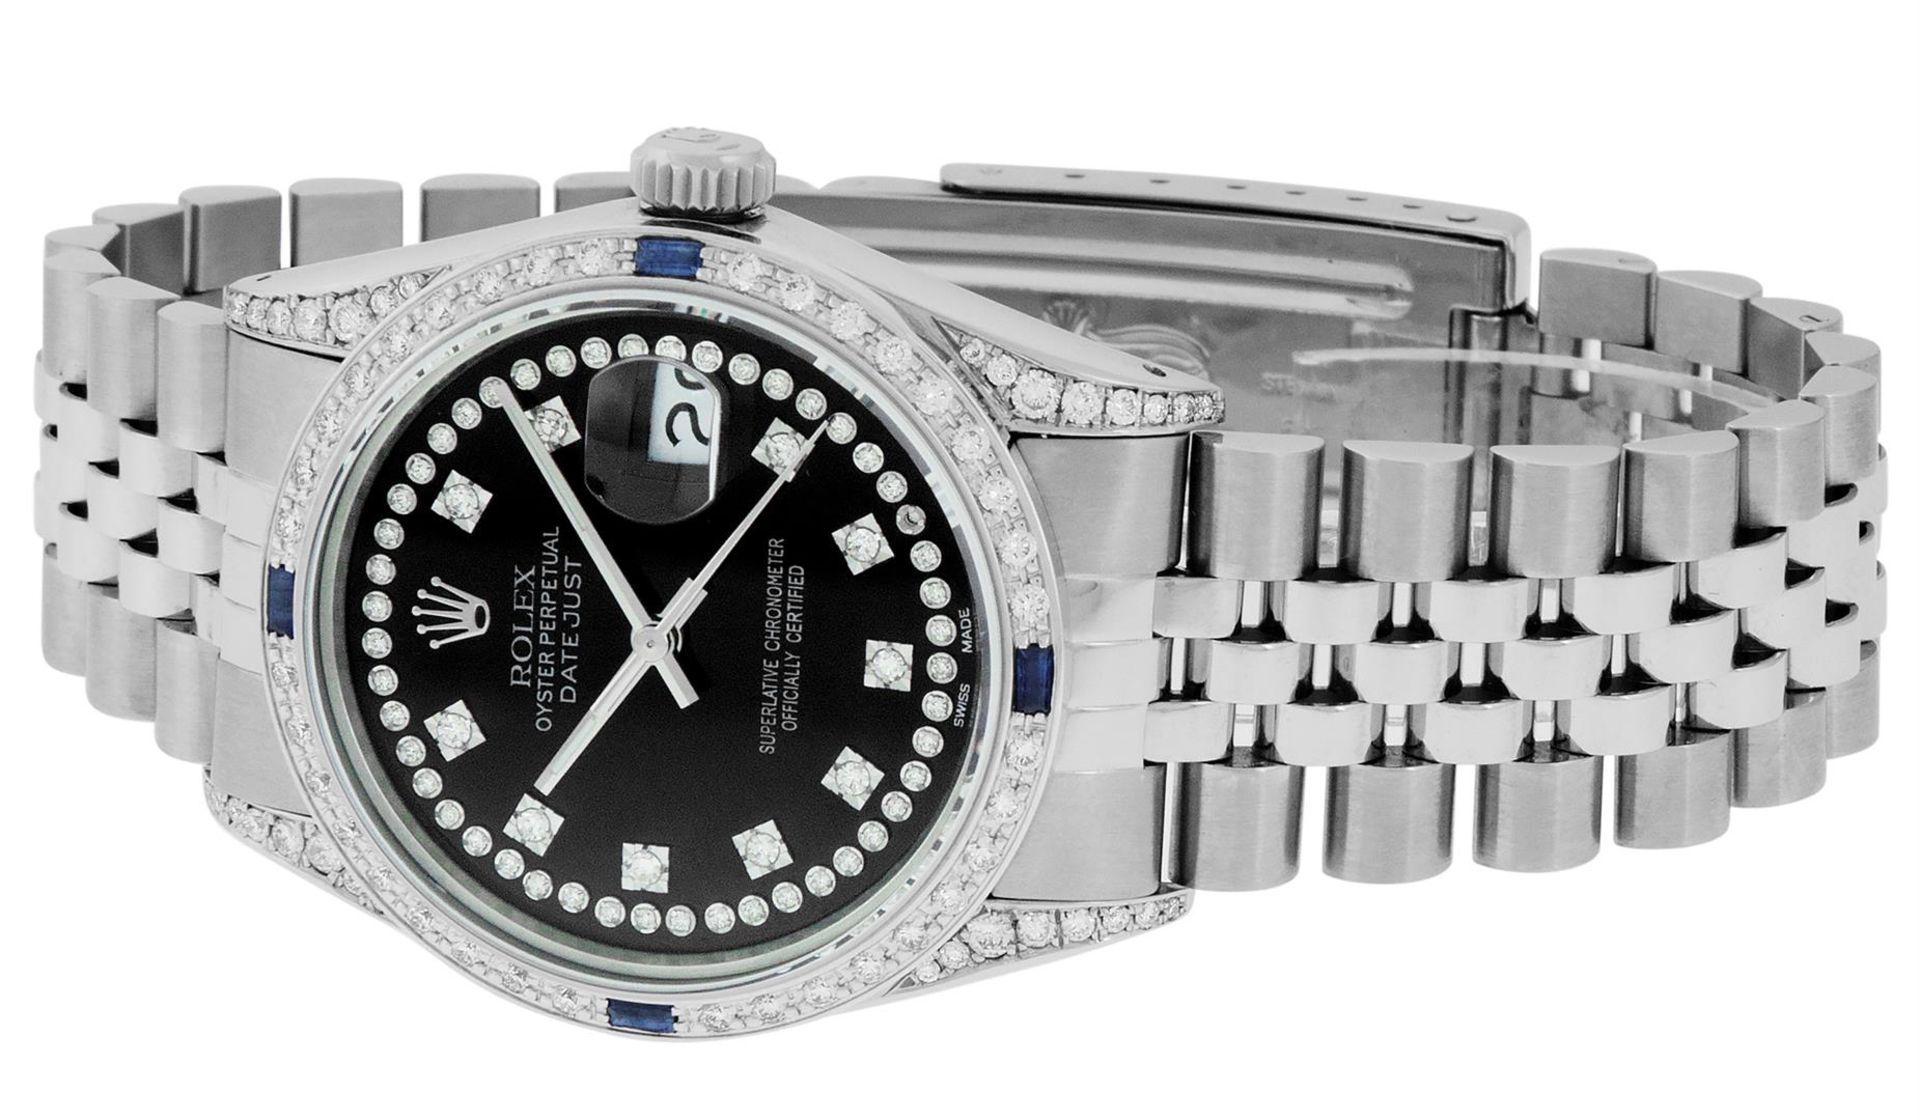 Rolex Mens Stainless Steel Black Diamond Lugs & Sapphire Datejust Wristwatch Oys - Image 2 of 9